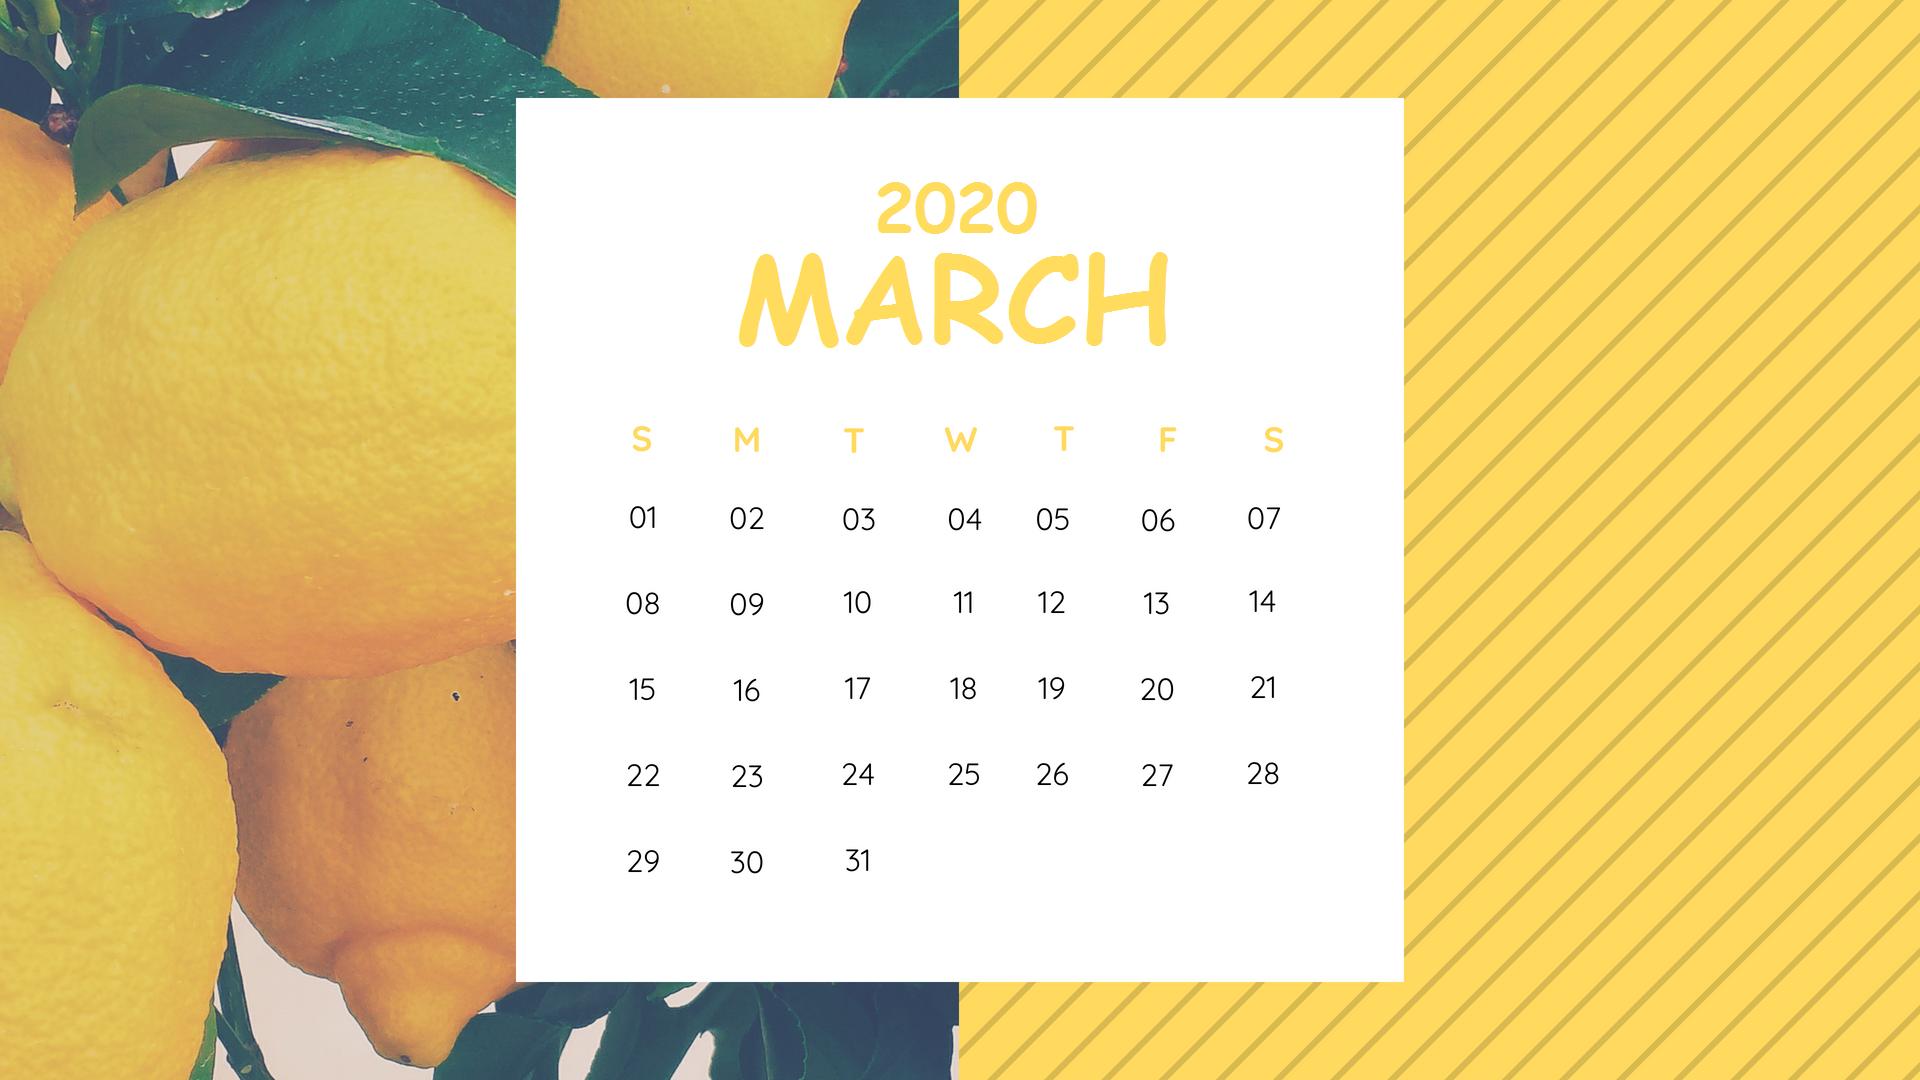 Cute March 2020 Calendar Wallpaper for Desktop and iPhone